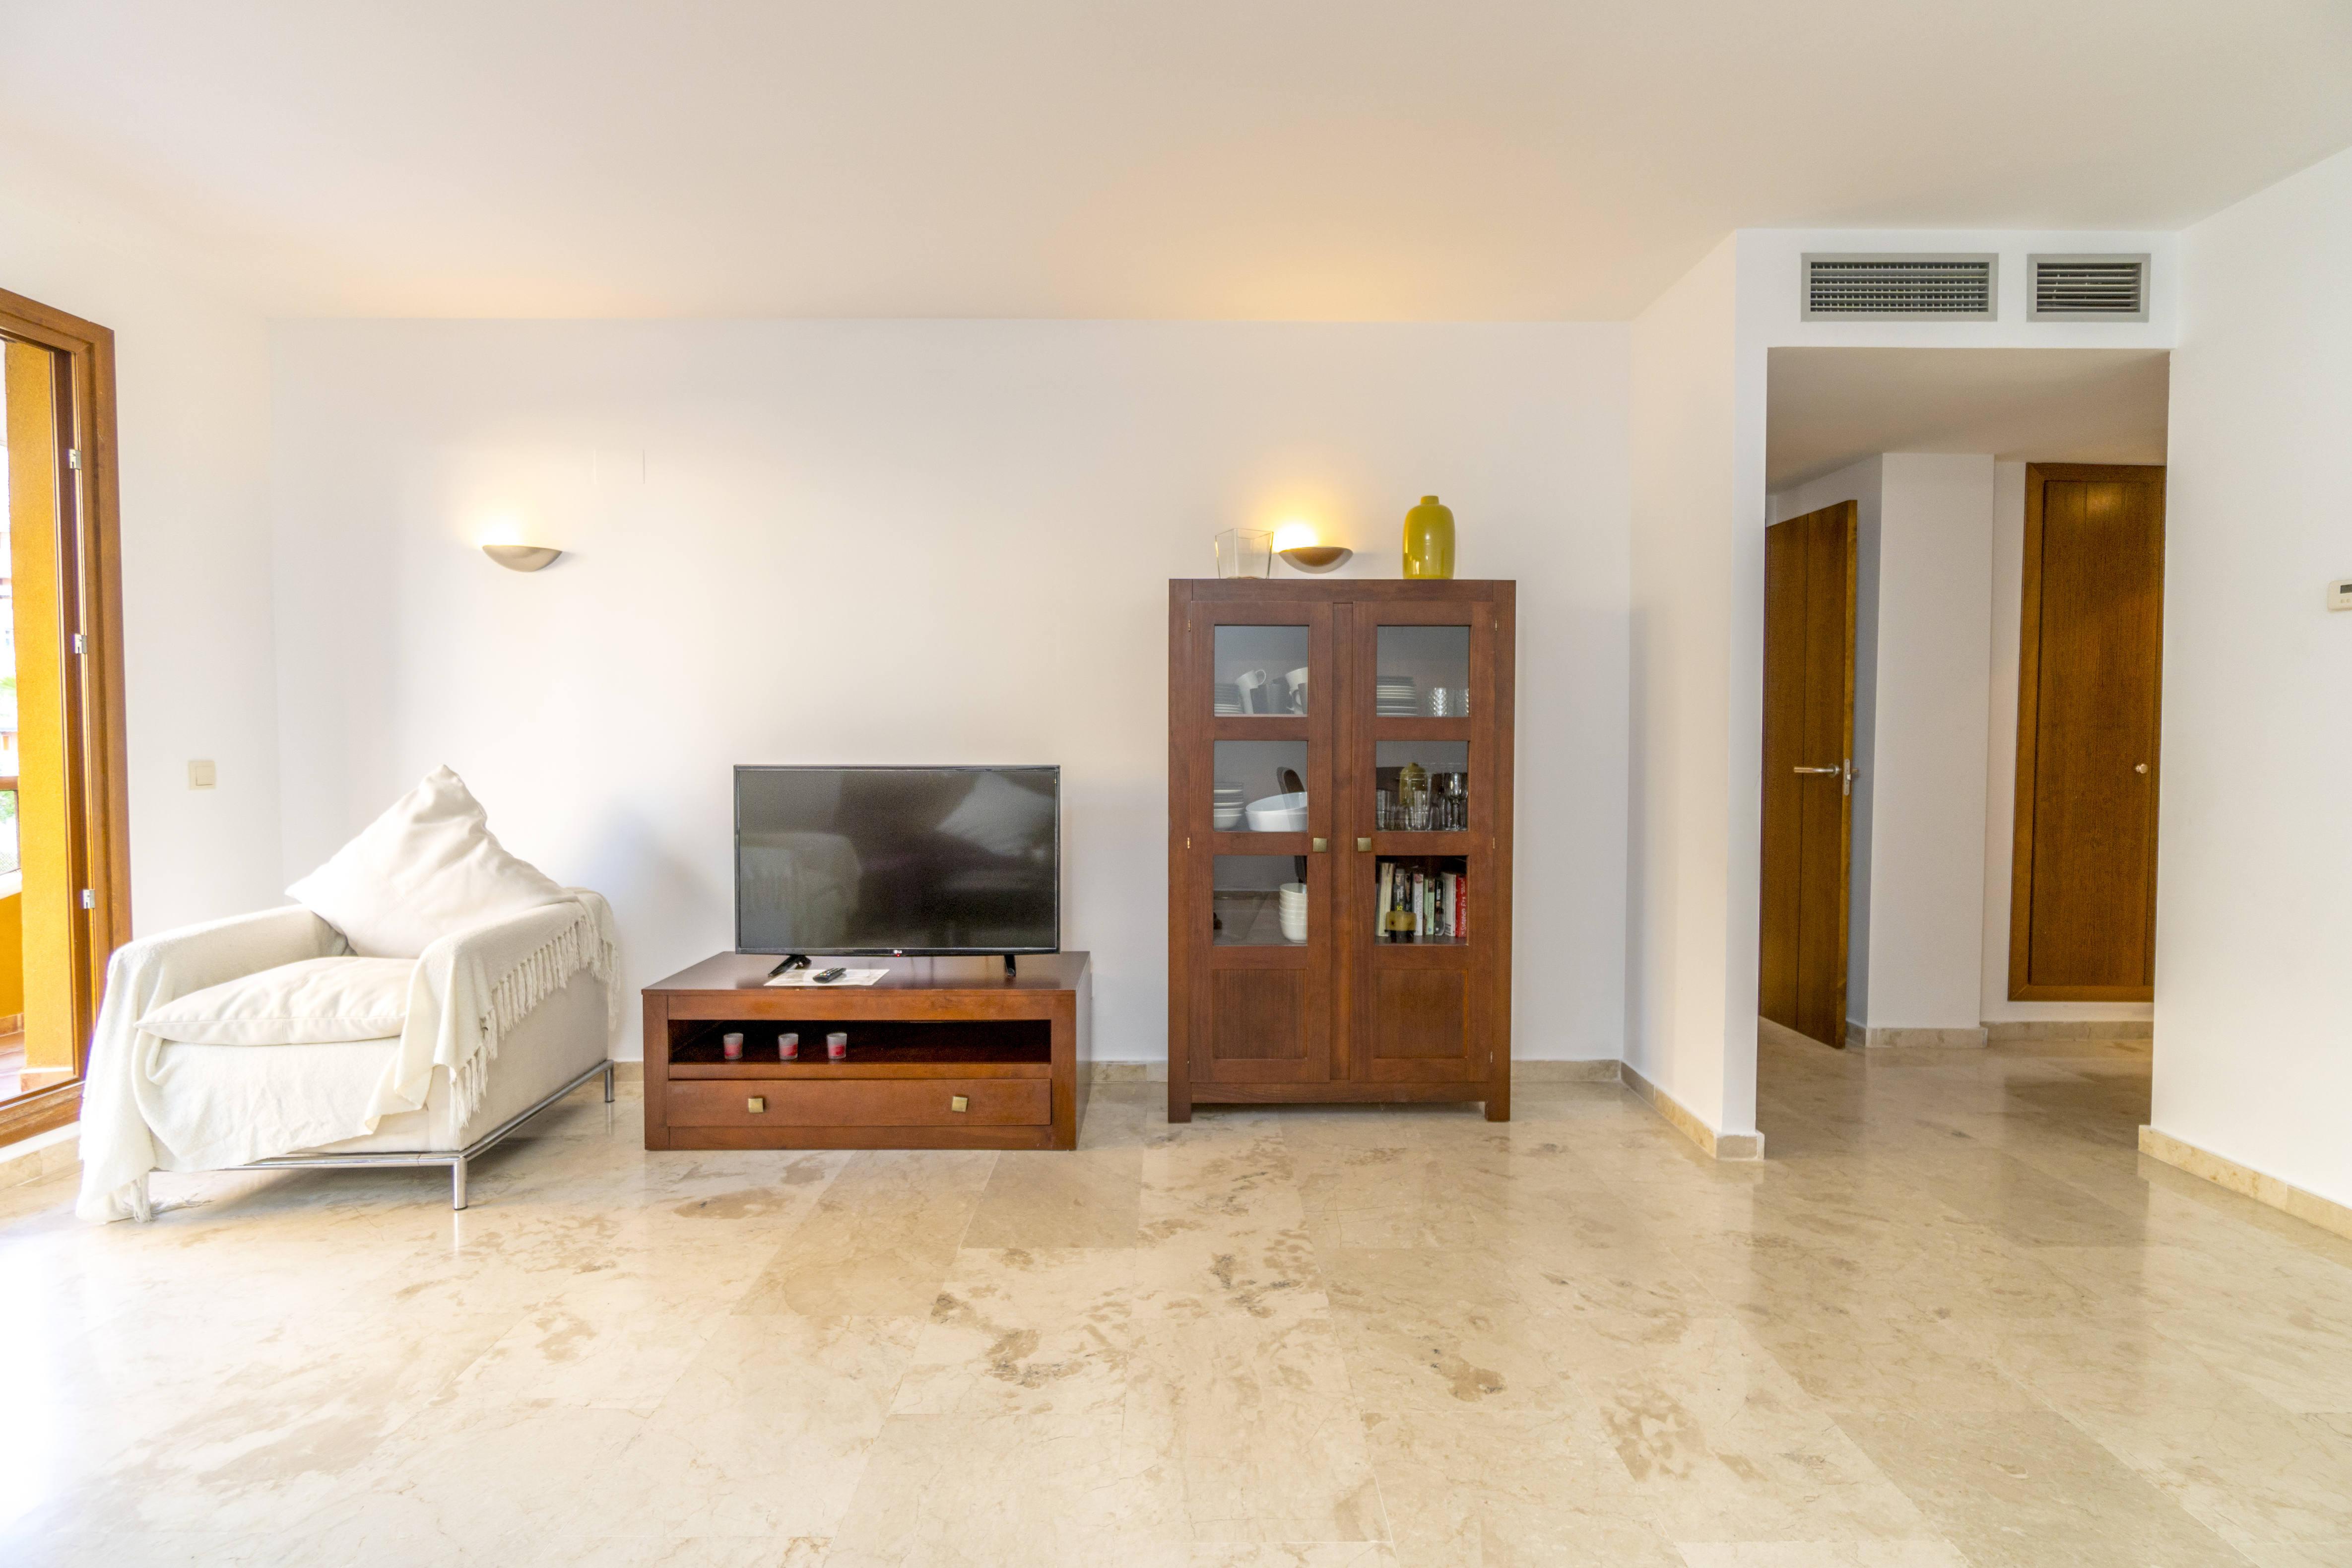 Apartment Espanhouse Ambar photo 22141042